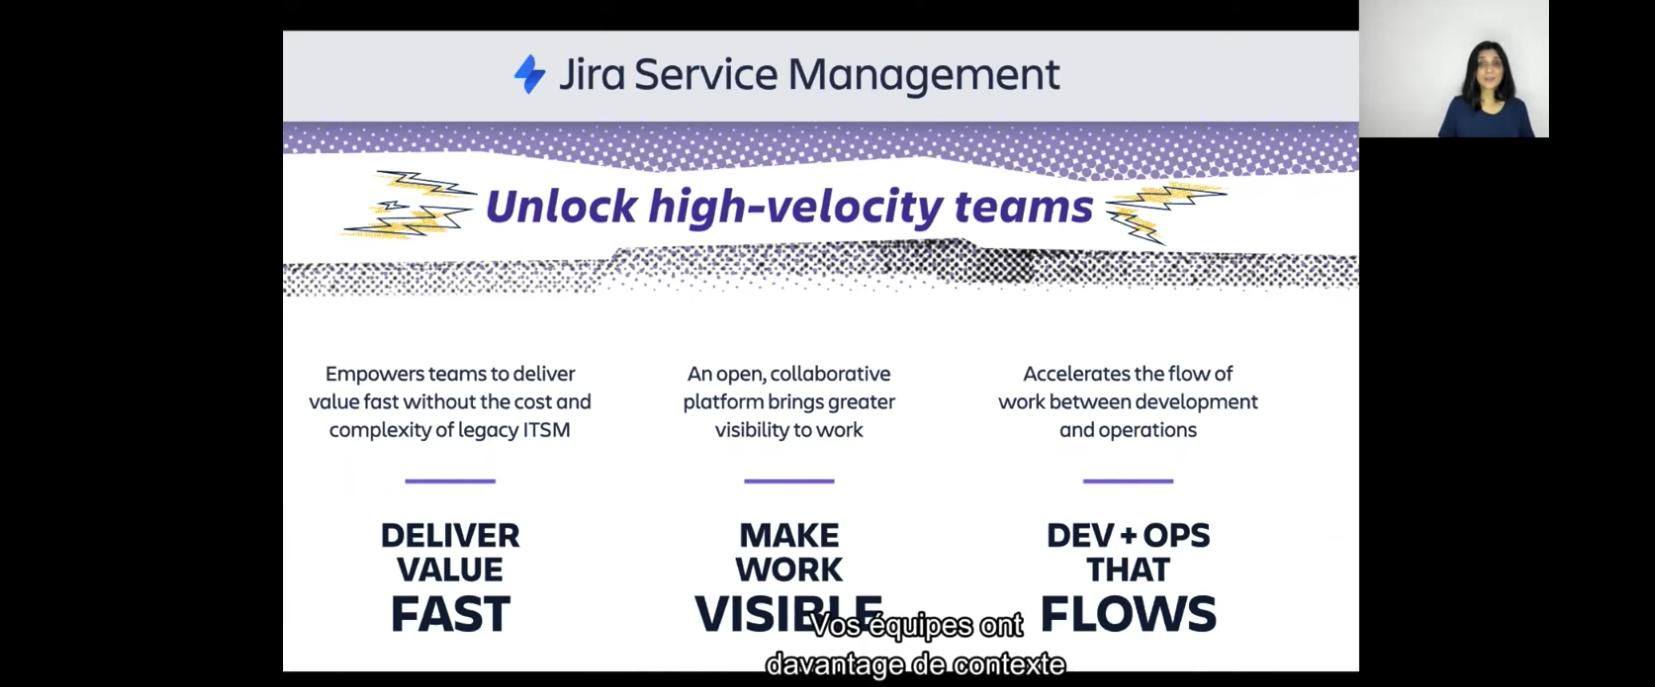 jira-service-management-keynote.png